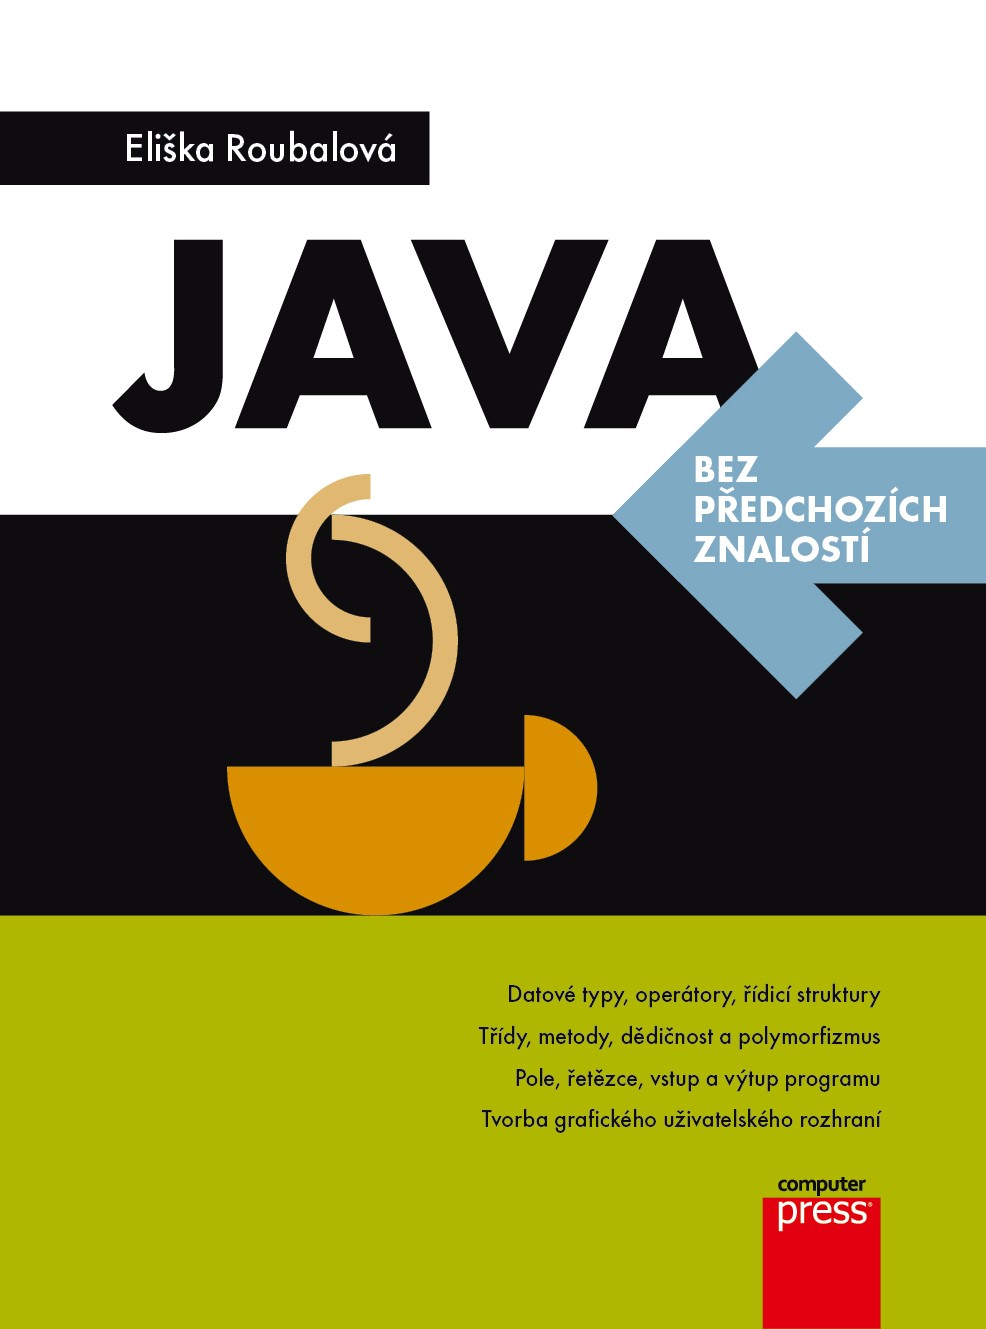 Java | Eliška Roubalová